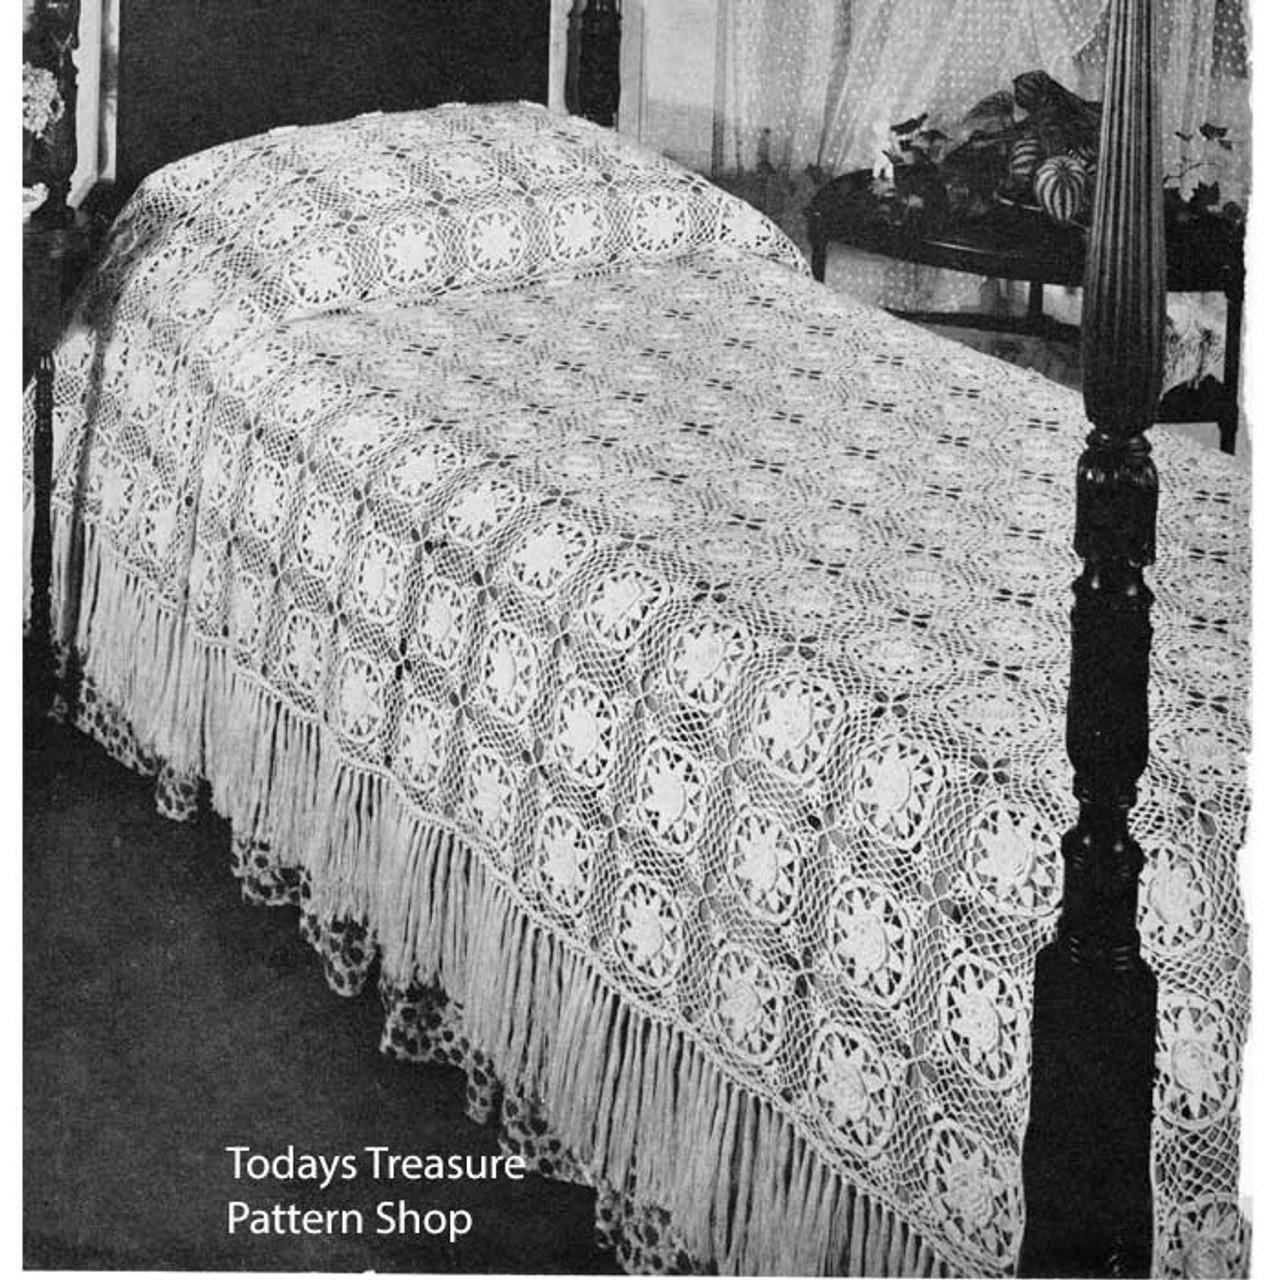 Vintage Louisiana Bayou Crocheted Bedspread Pattern from Ameerican Thread